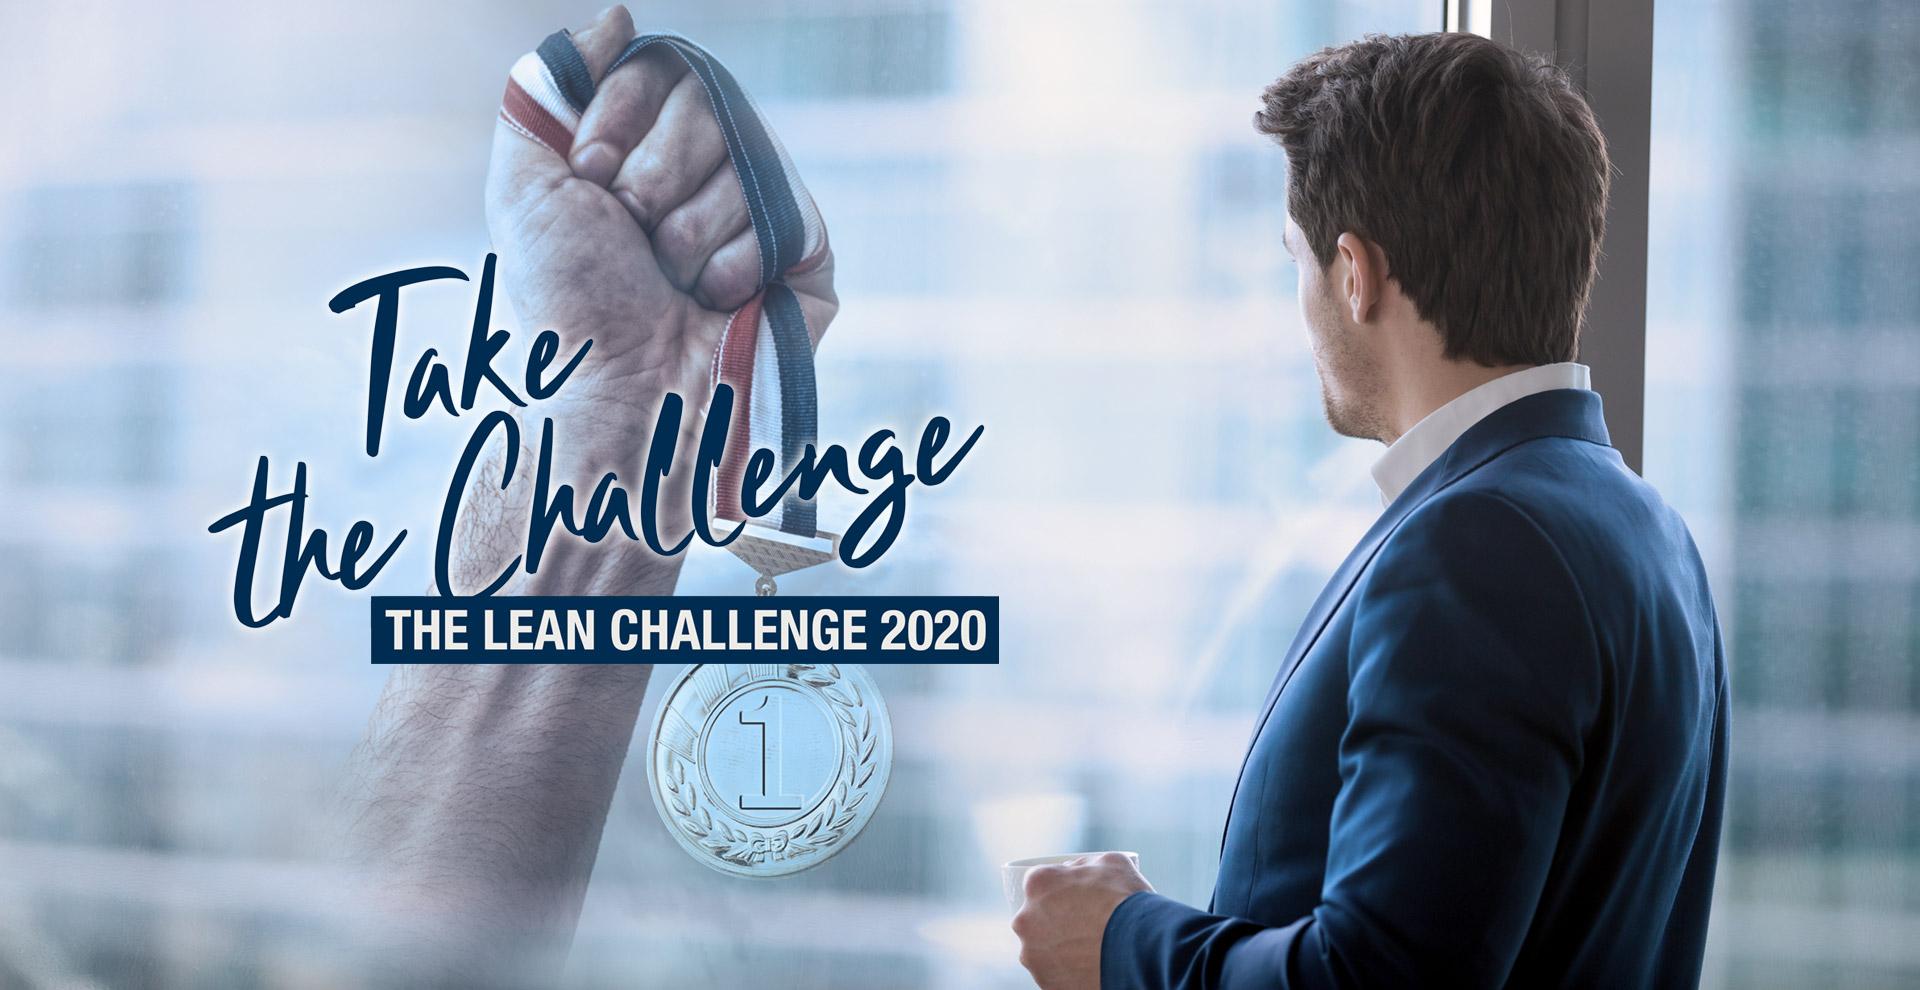 Lean Challenge 2020